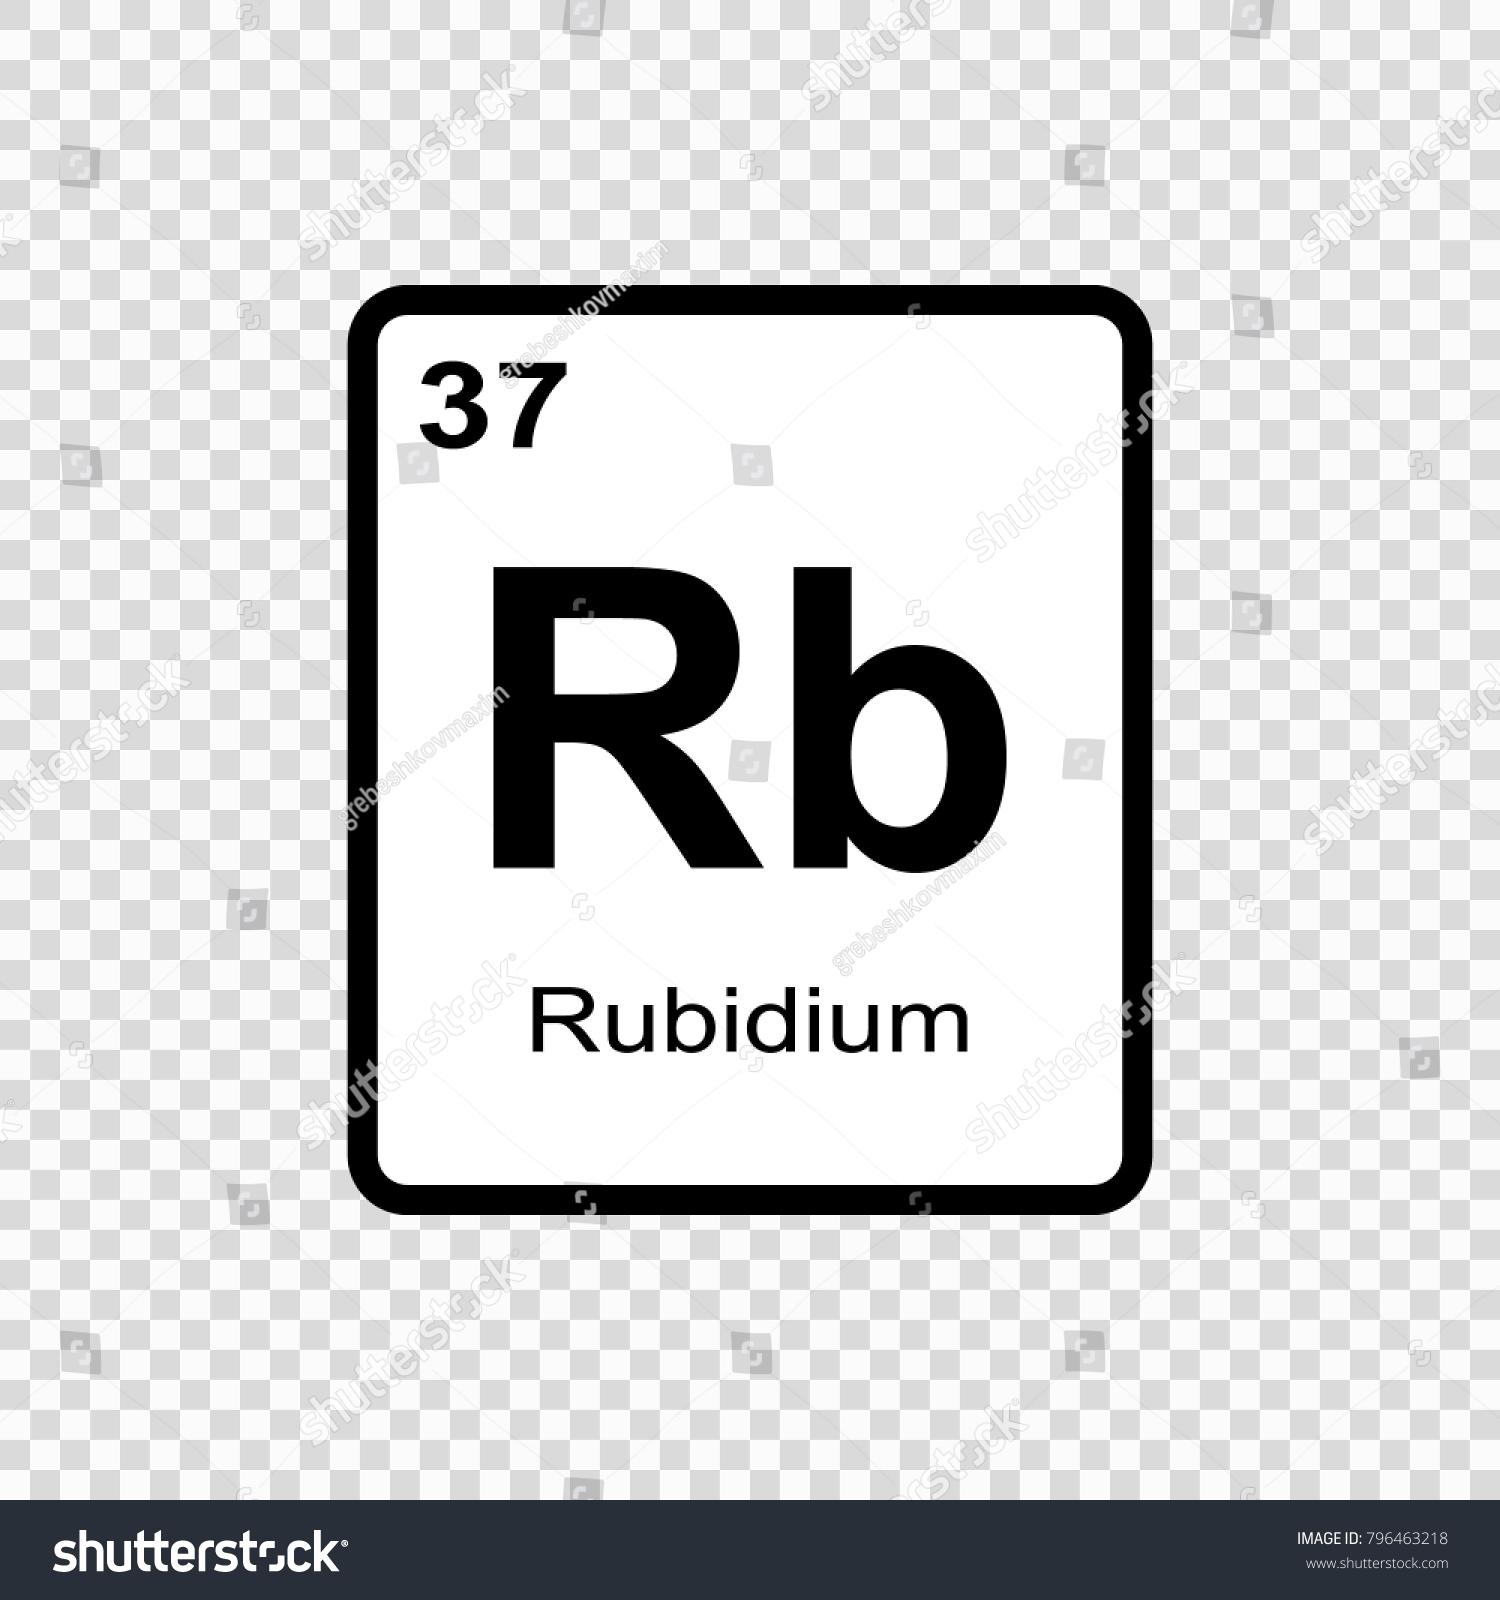 Rubidium Chemical Element Sign Atomic Number Stock Vector Royalty